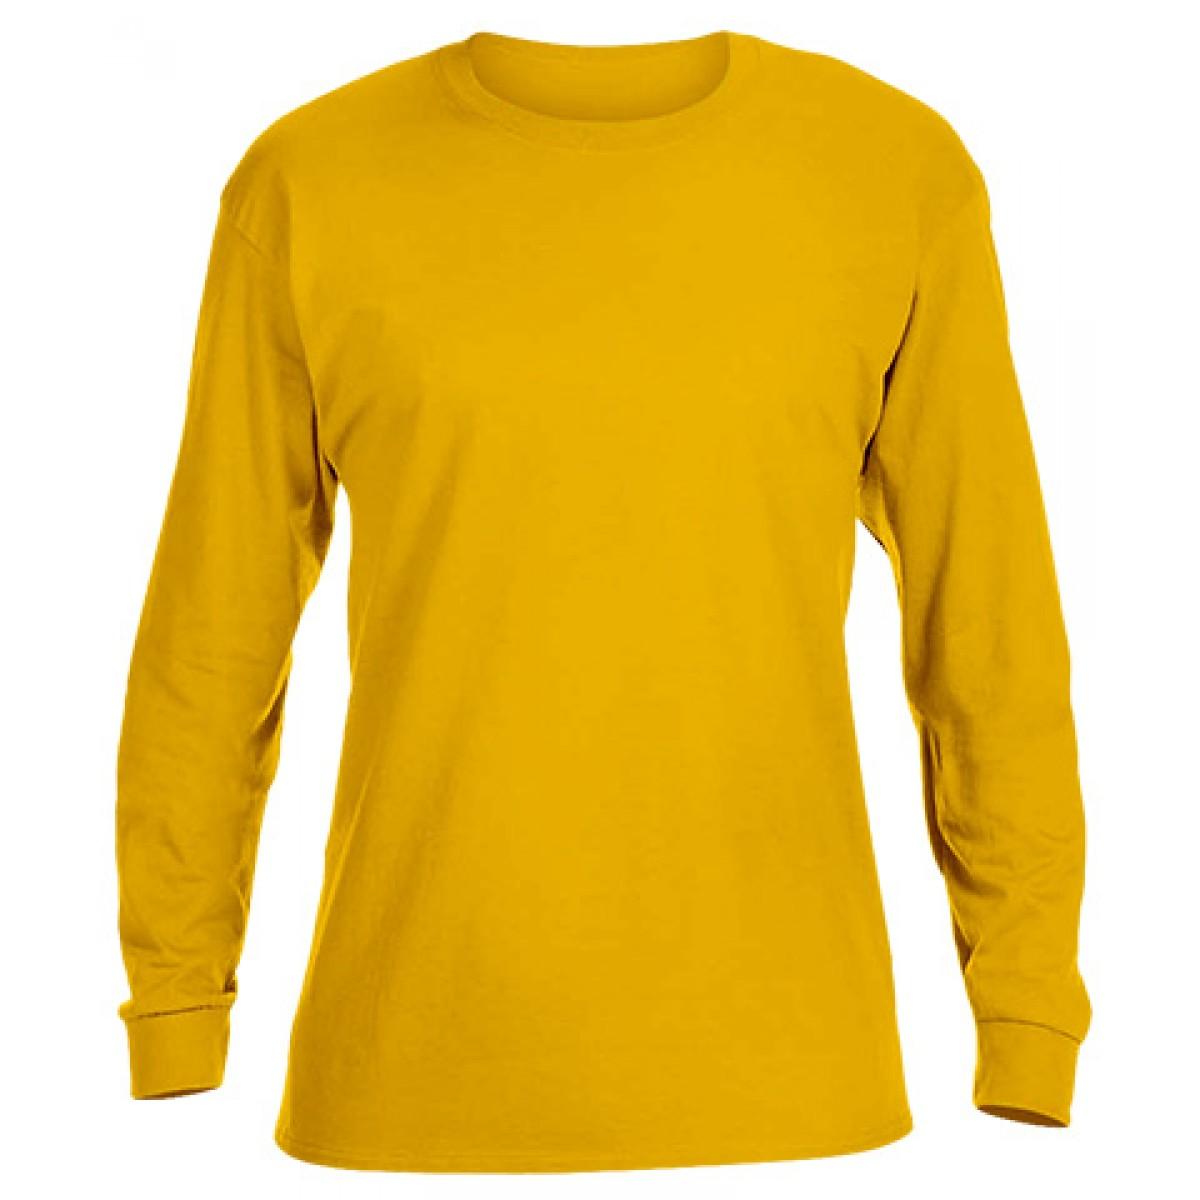 Heavy Cotton Long-Sleeve Adidas Shirt-Gold-XL